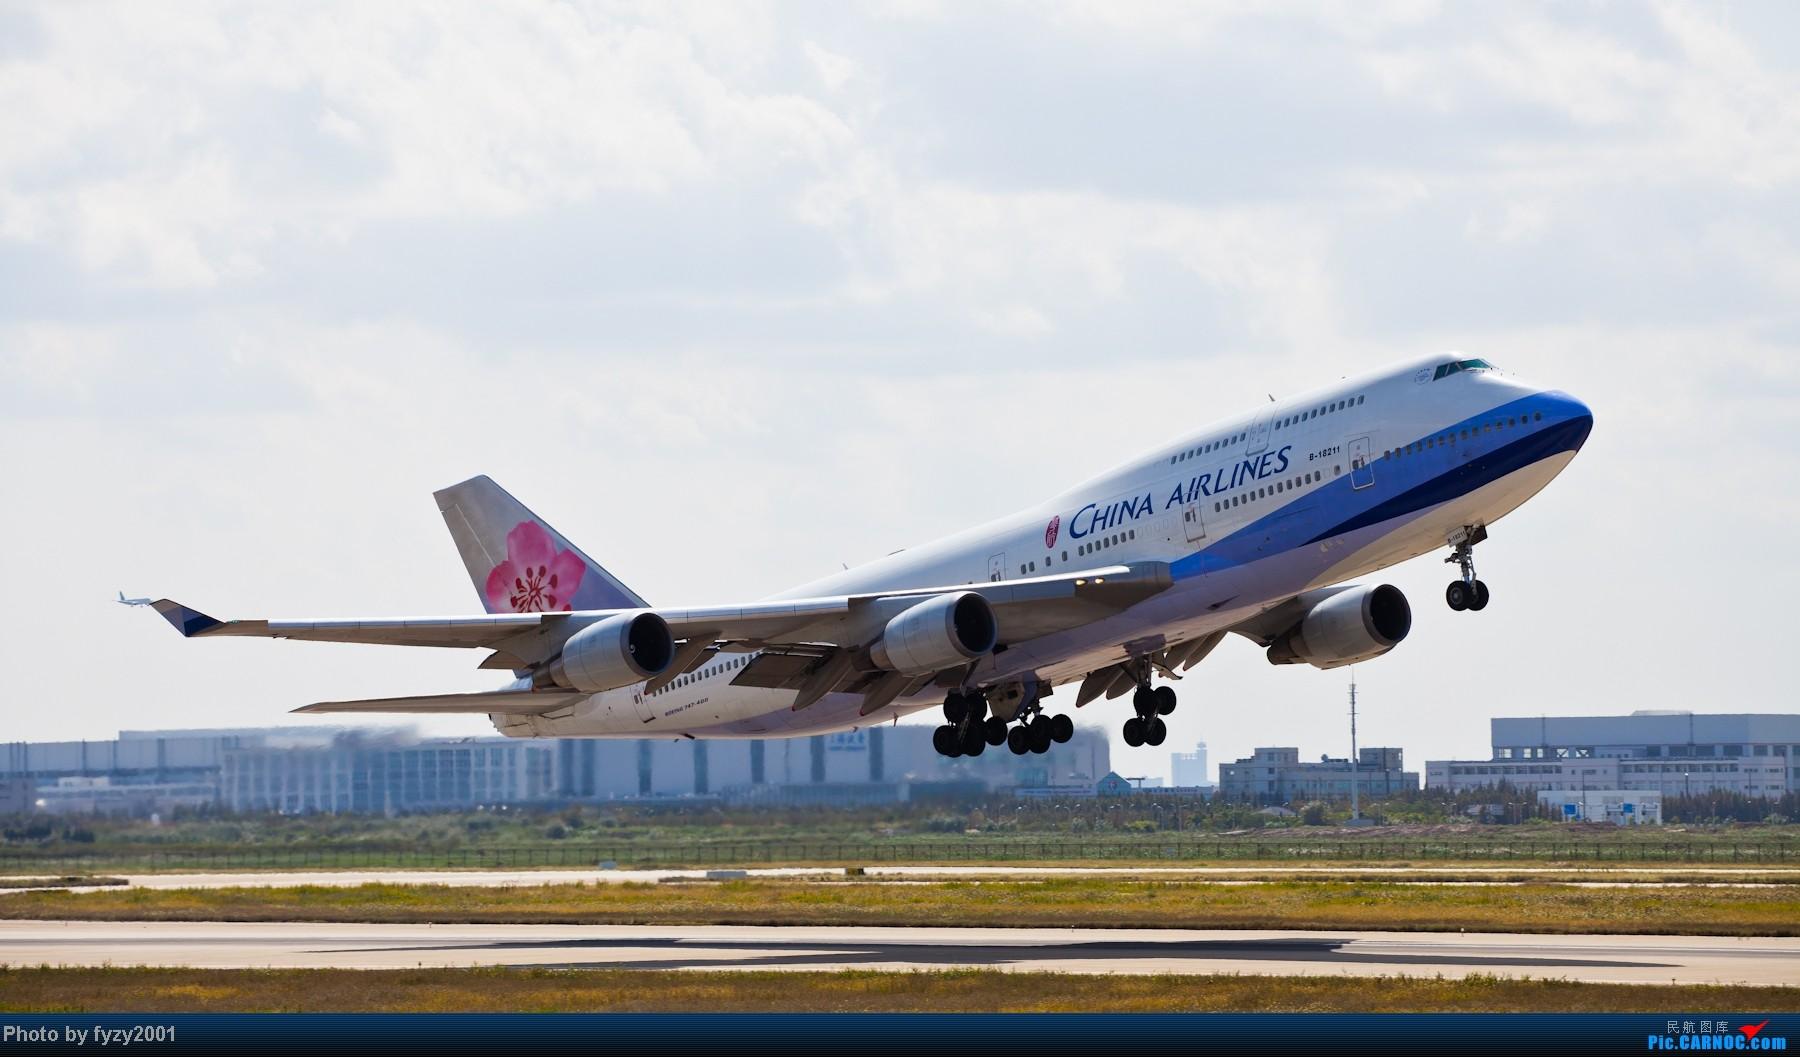 Re:[原创][无锡西站]长假PVG蹲守~~~~只发大图,多图杀猫~~~~ BOEING 747-400 B-18211 中国上海浦东机场